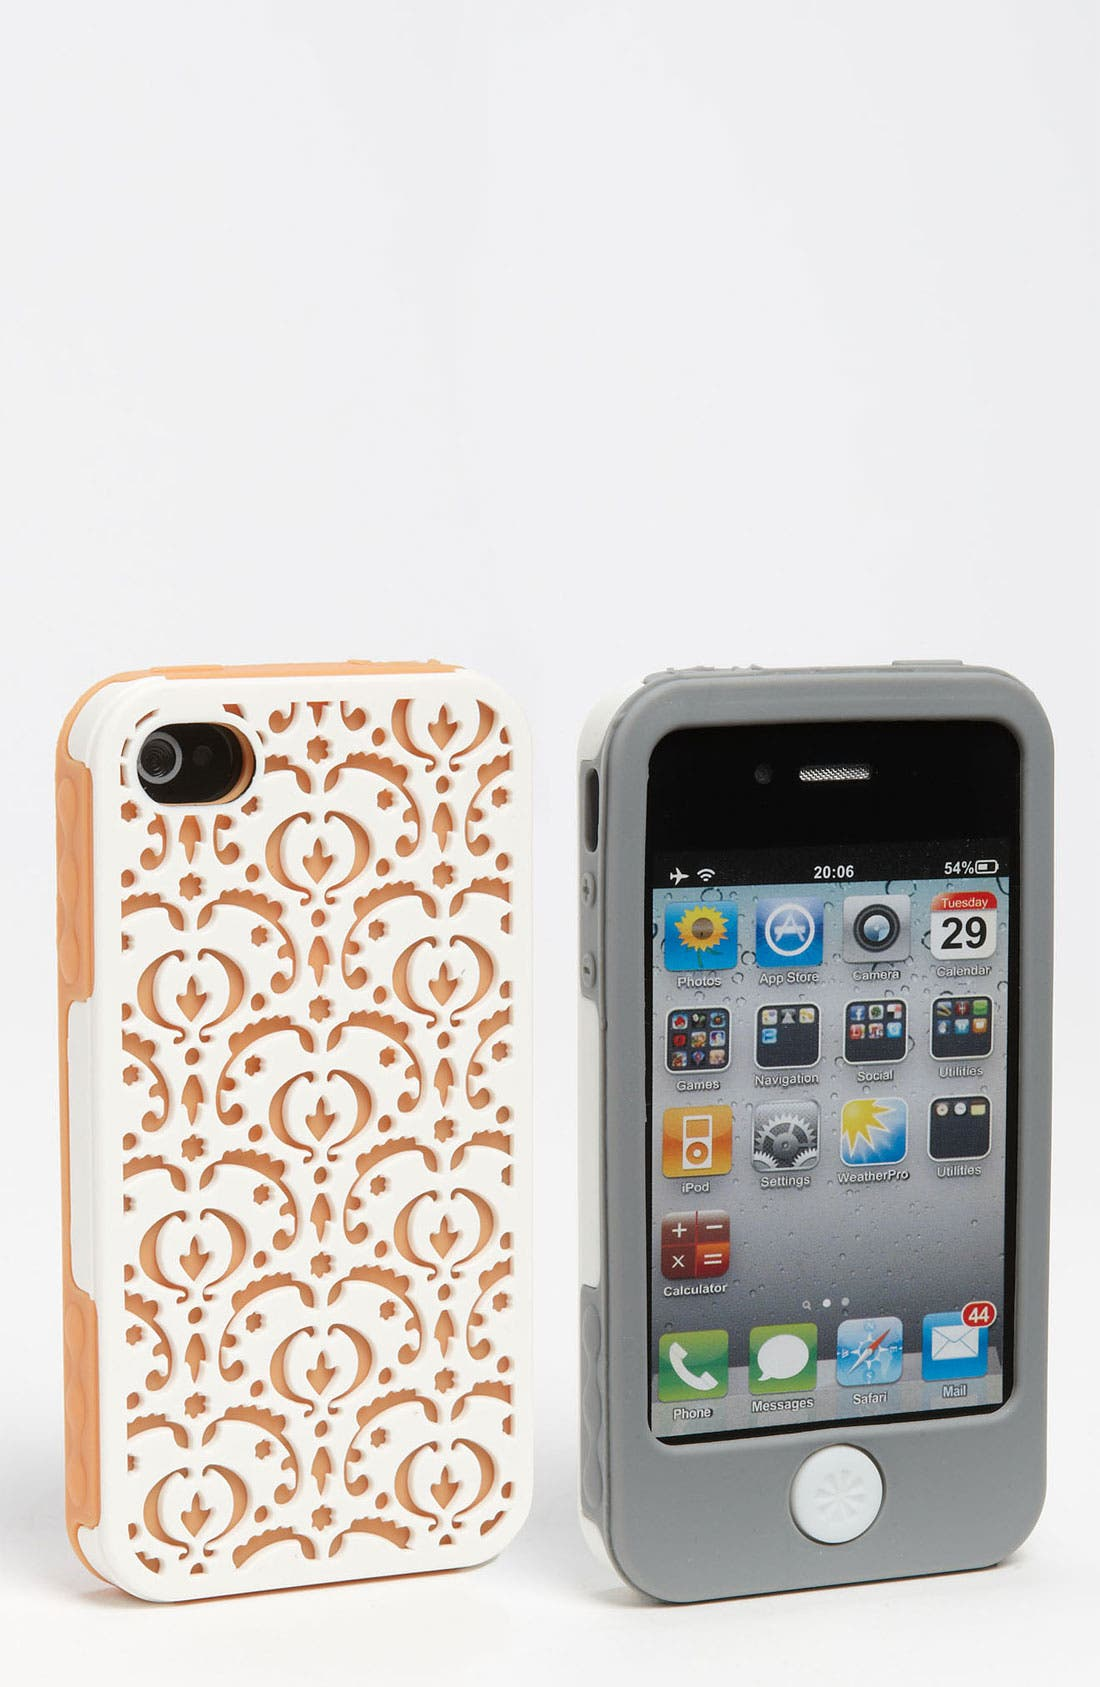 Alternate Image 1 Selected - Tech Candy 'Bordeaux' iPhone 4 Case Set